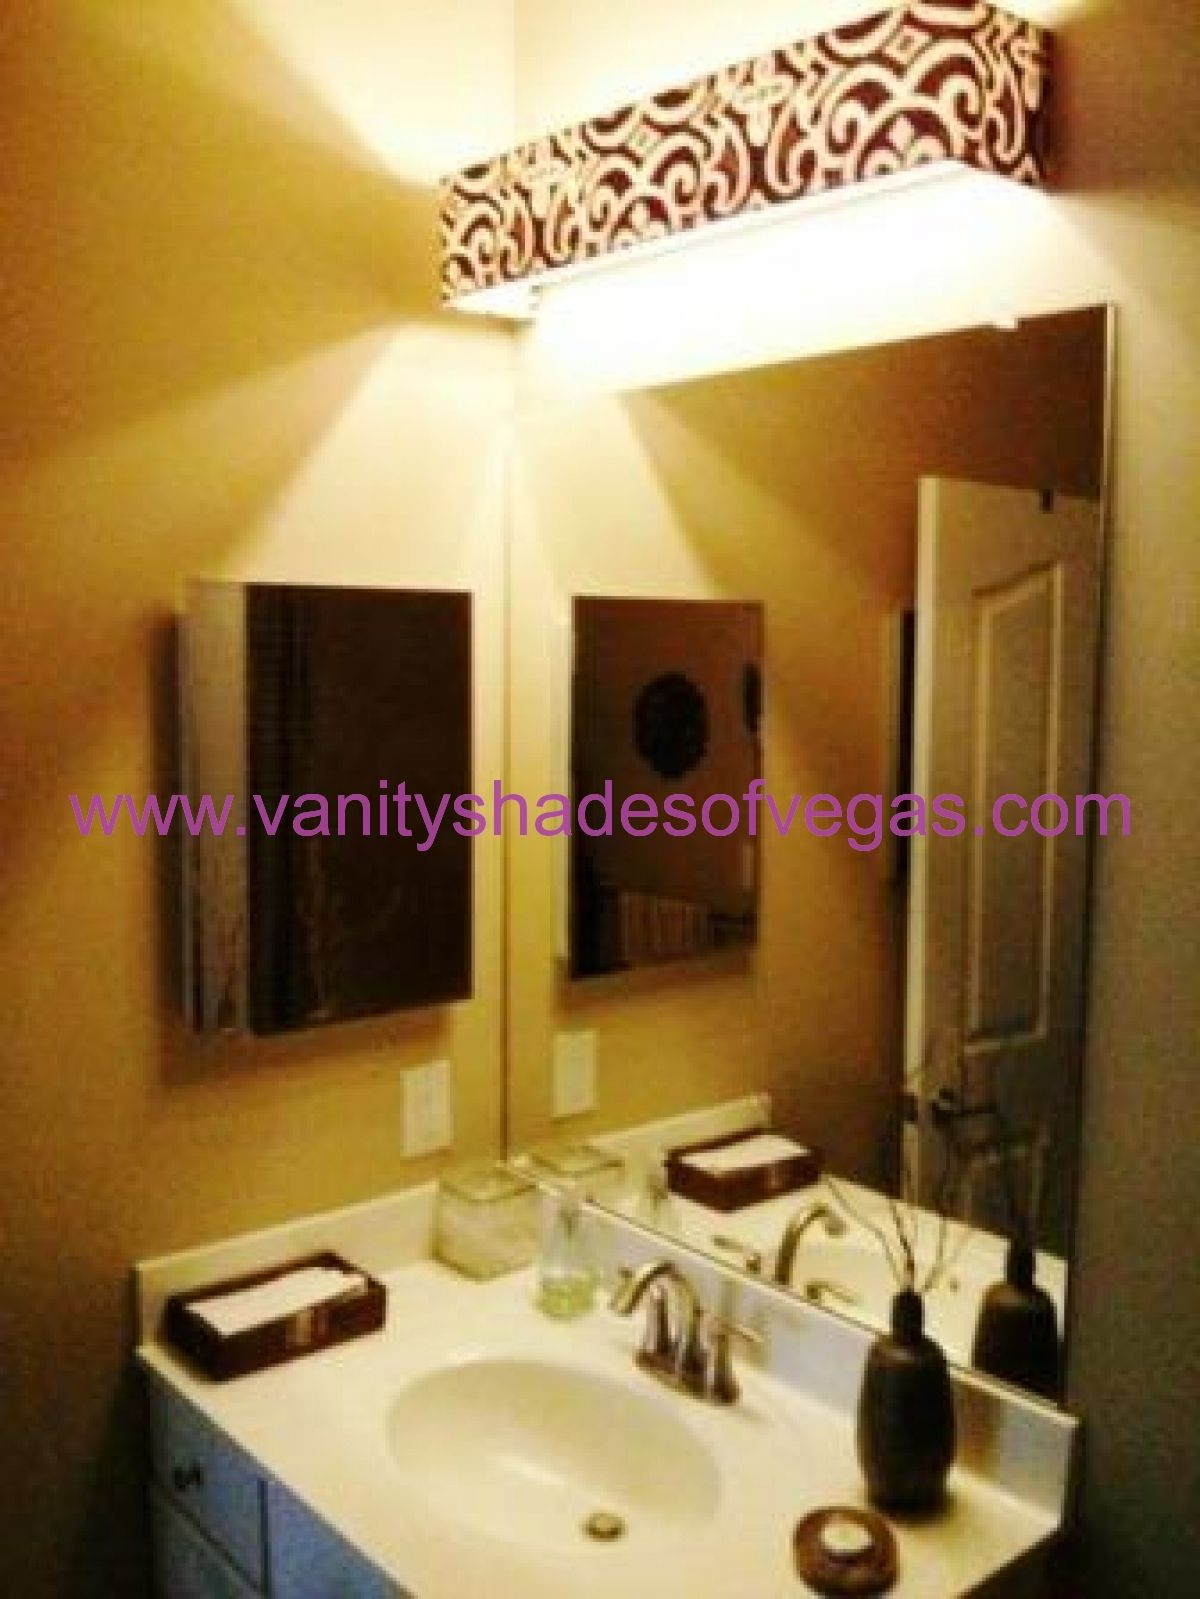 Portfolio of Vanity Shades | Pinterest | Bathroom light fixtures ...